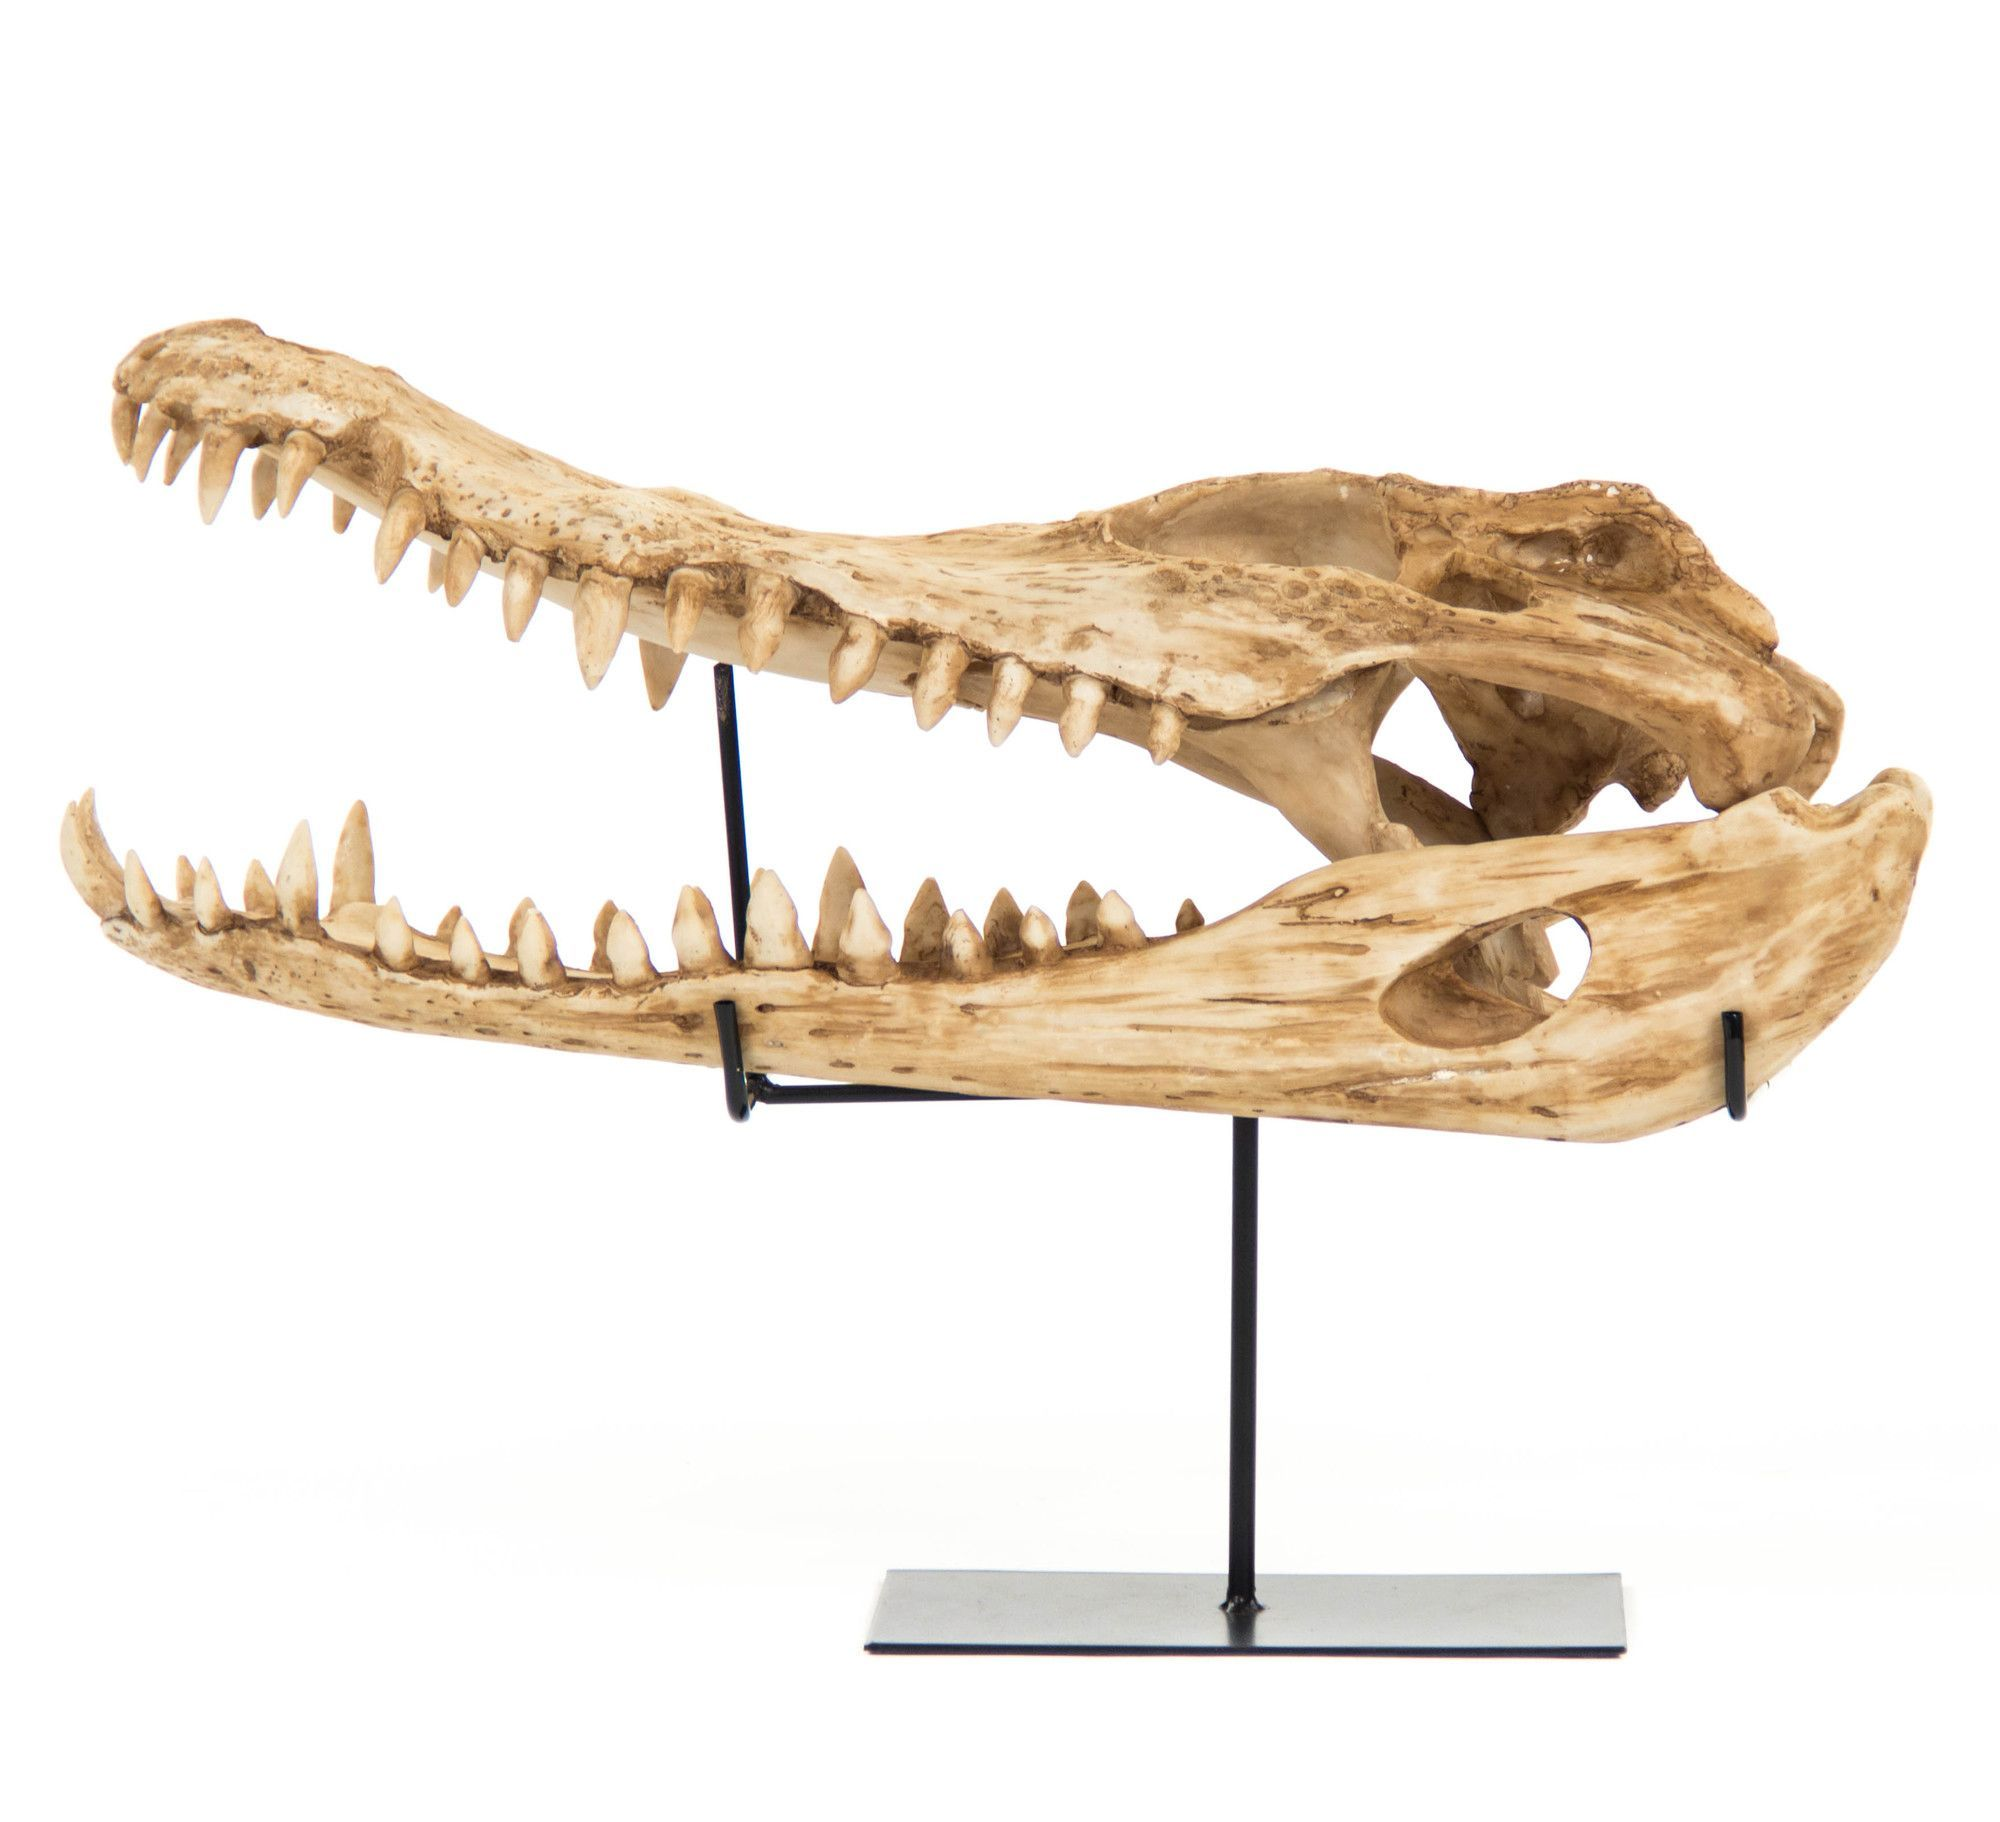 Alligator Skull With Base Wall Décor Decorative Sculpture Alligator Skull